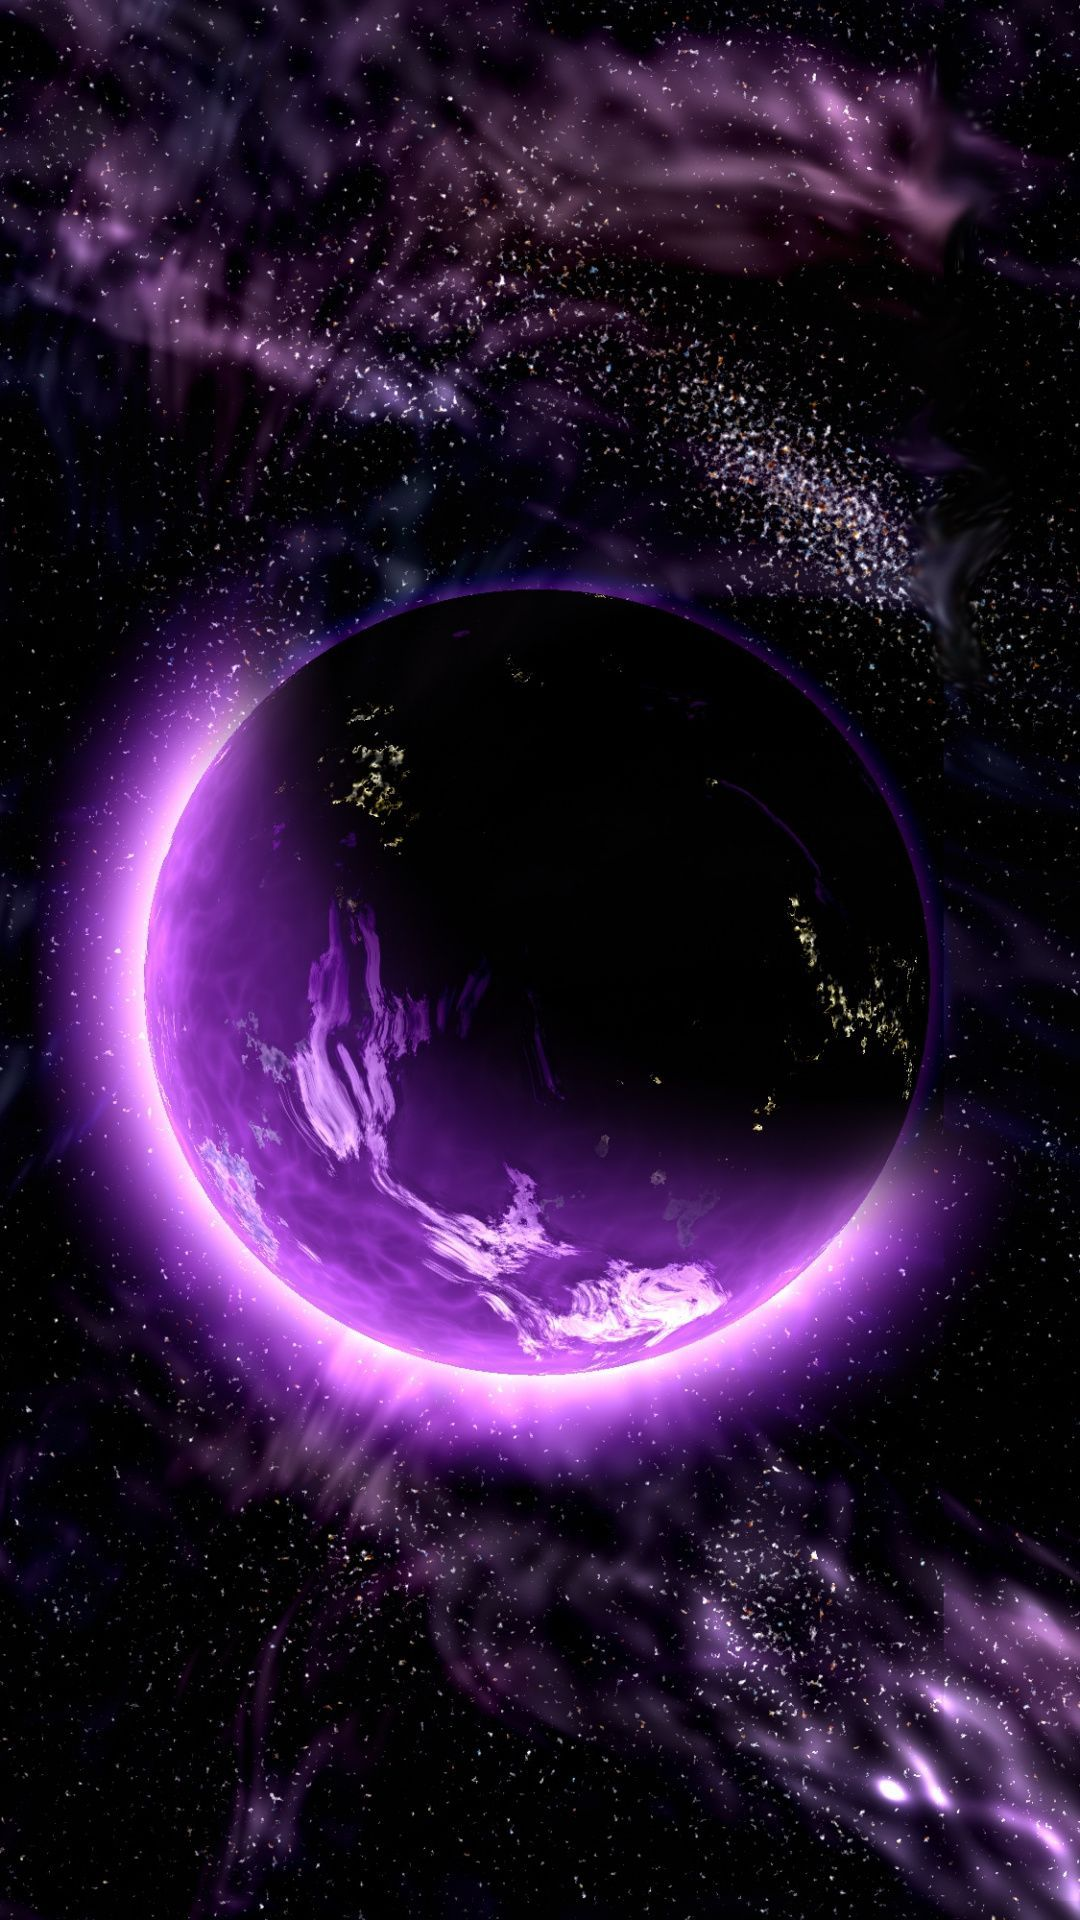 Обои atmosphere, violet, colors. Космос foto 7